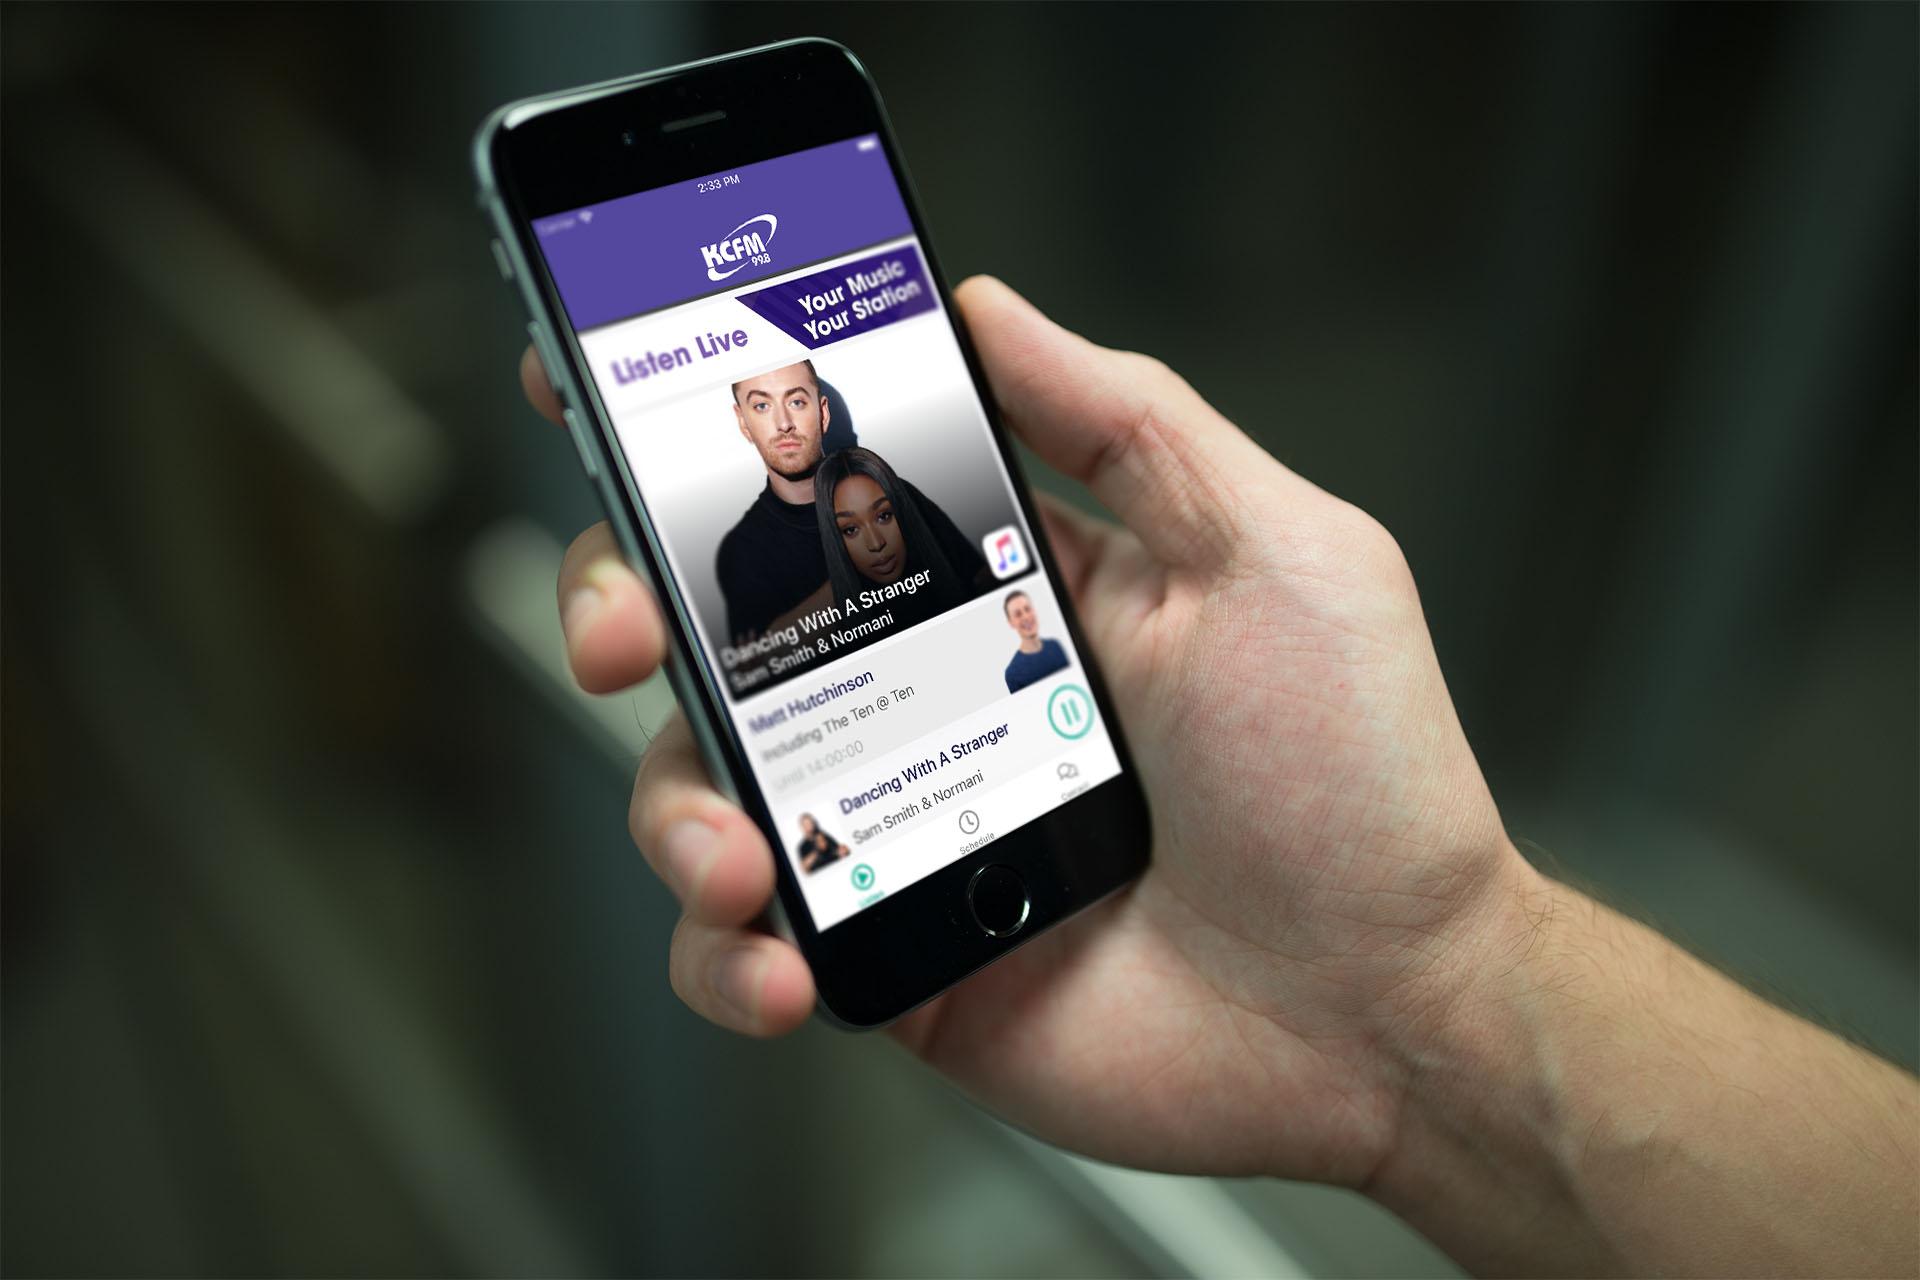 KCFM App On A Phone